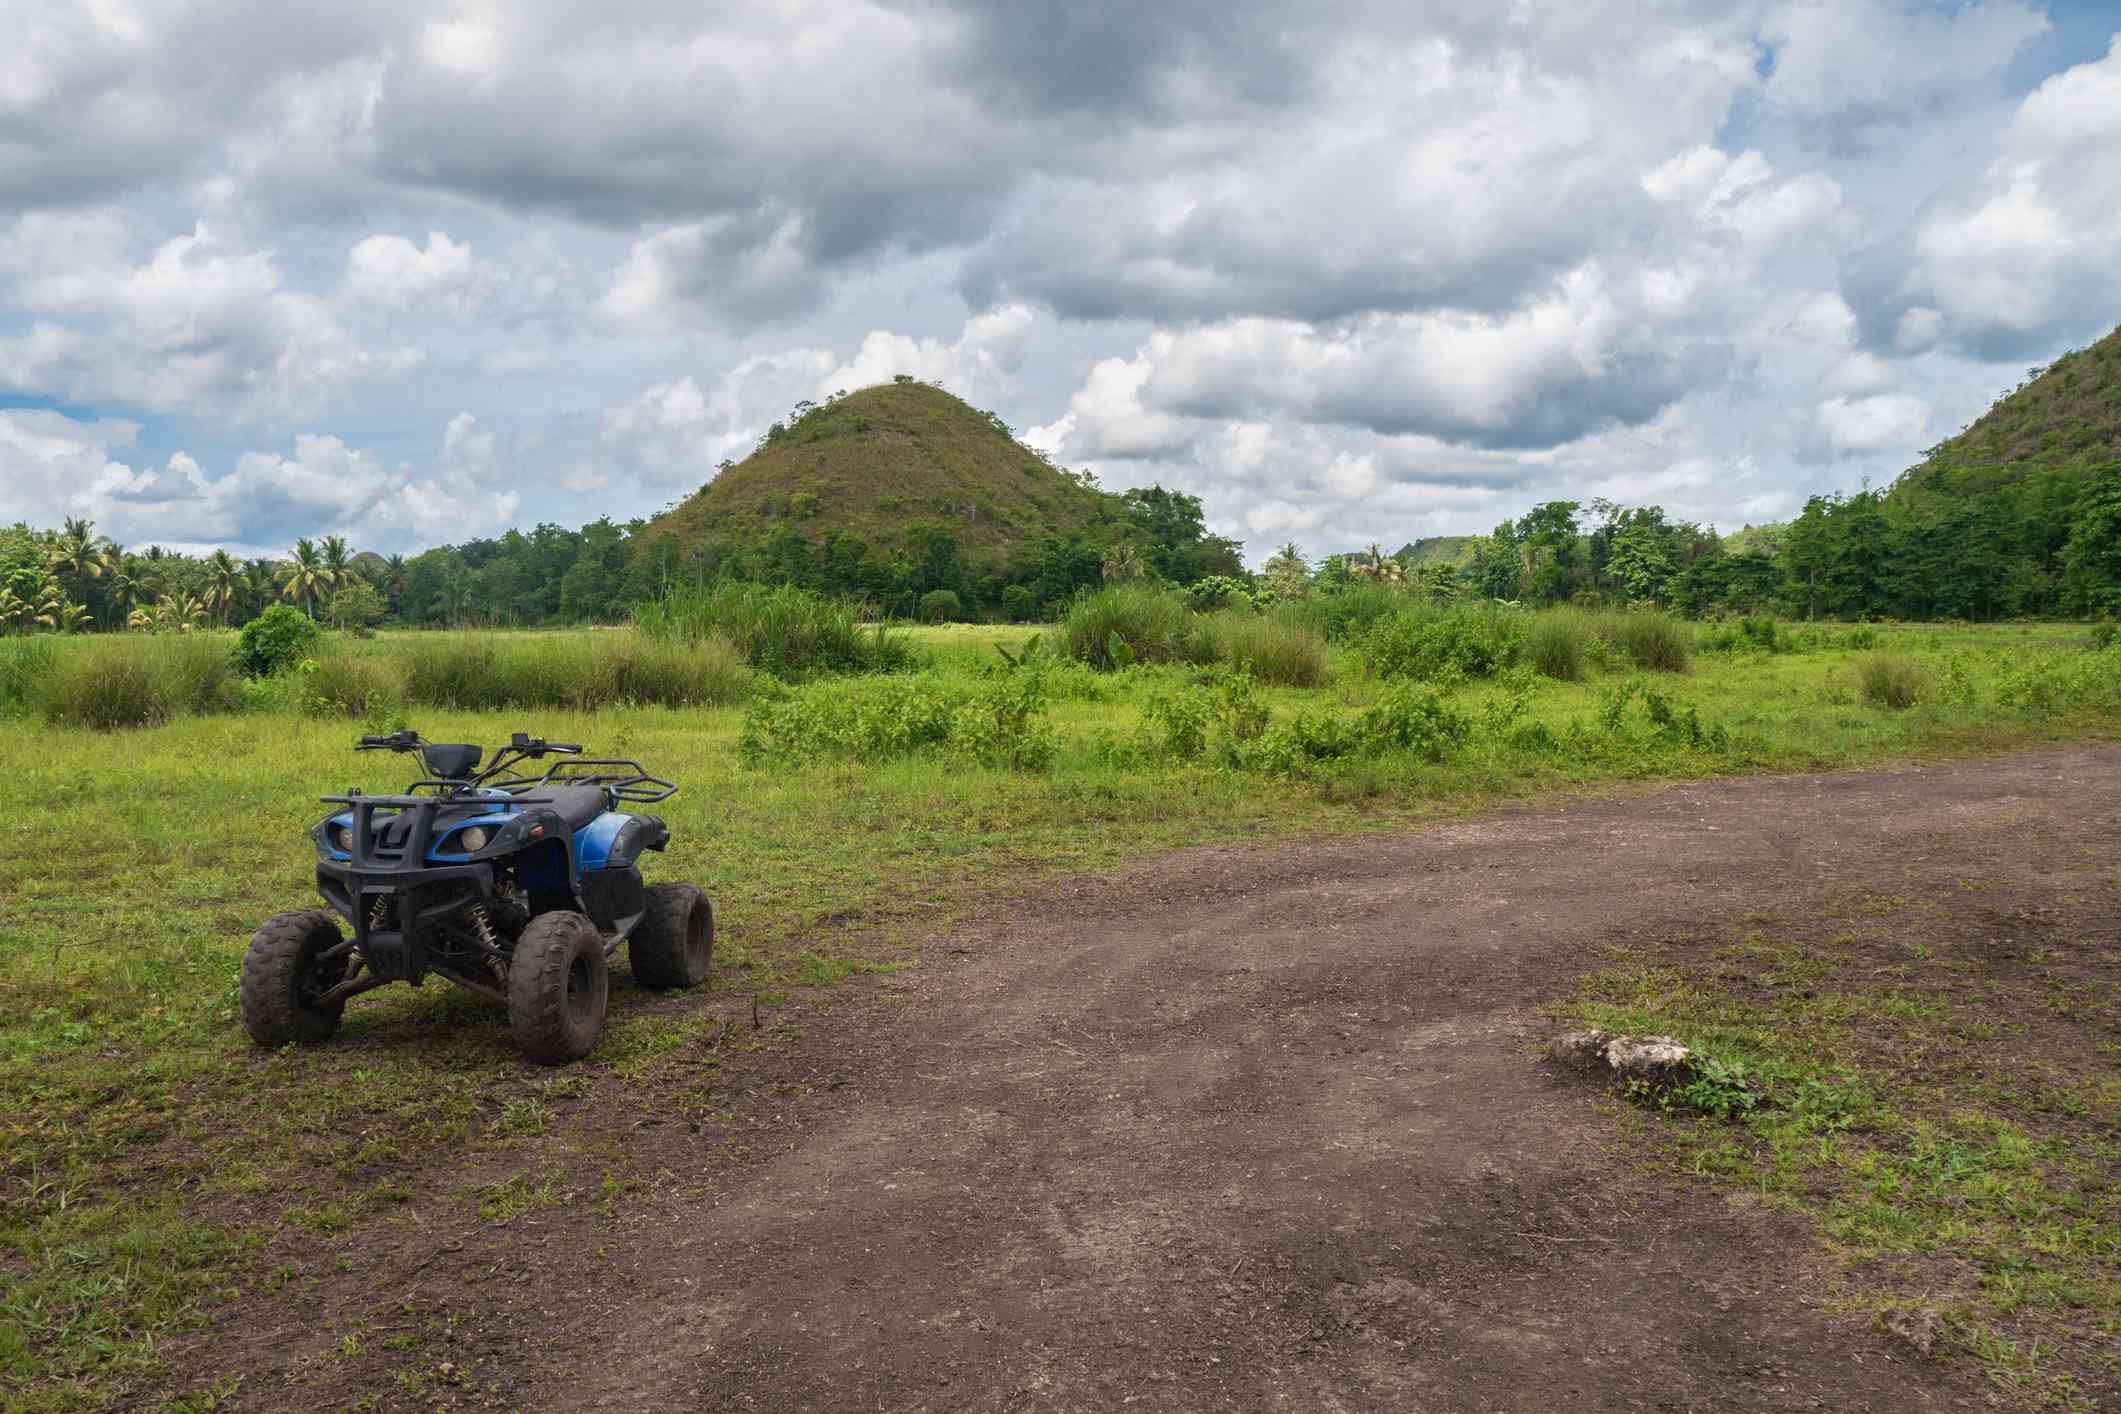 ATV near Chocolate Hills, Bohol, Philippines